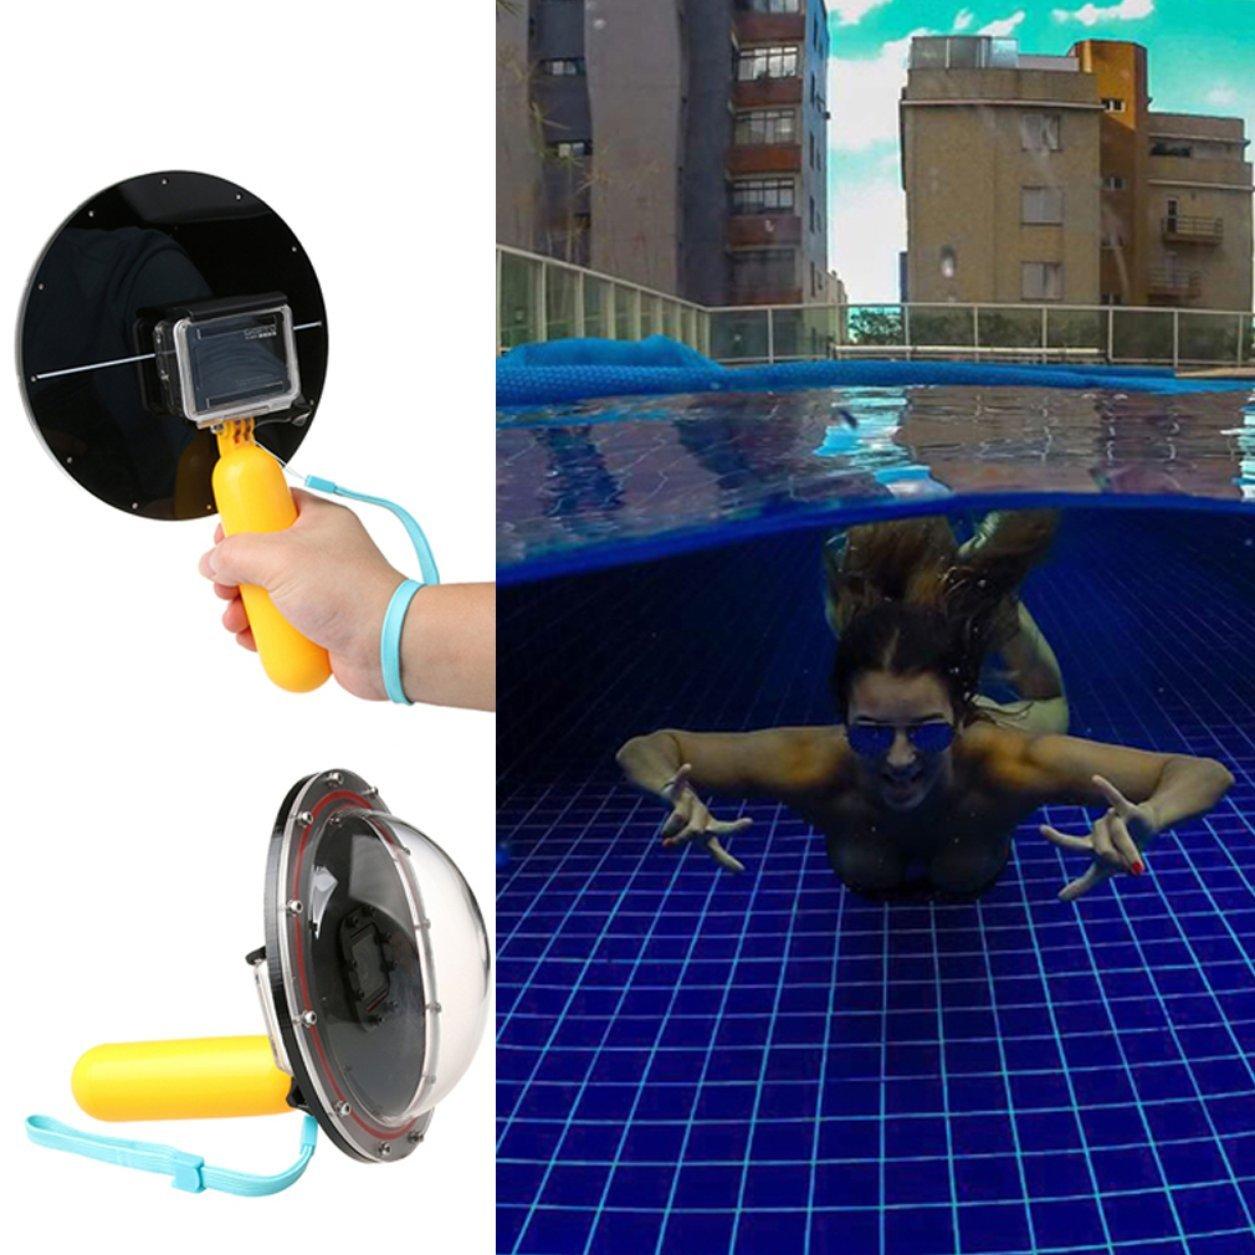 Hot Dome Port Underwater Diving Camera Lens Cover for Gopro Cameras(Color:Black) B07KP81FM4